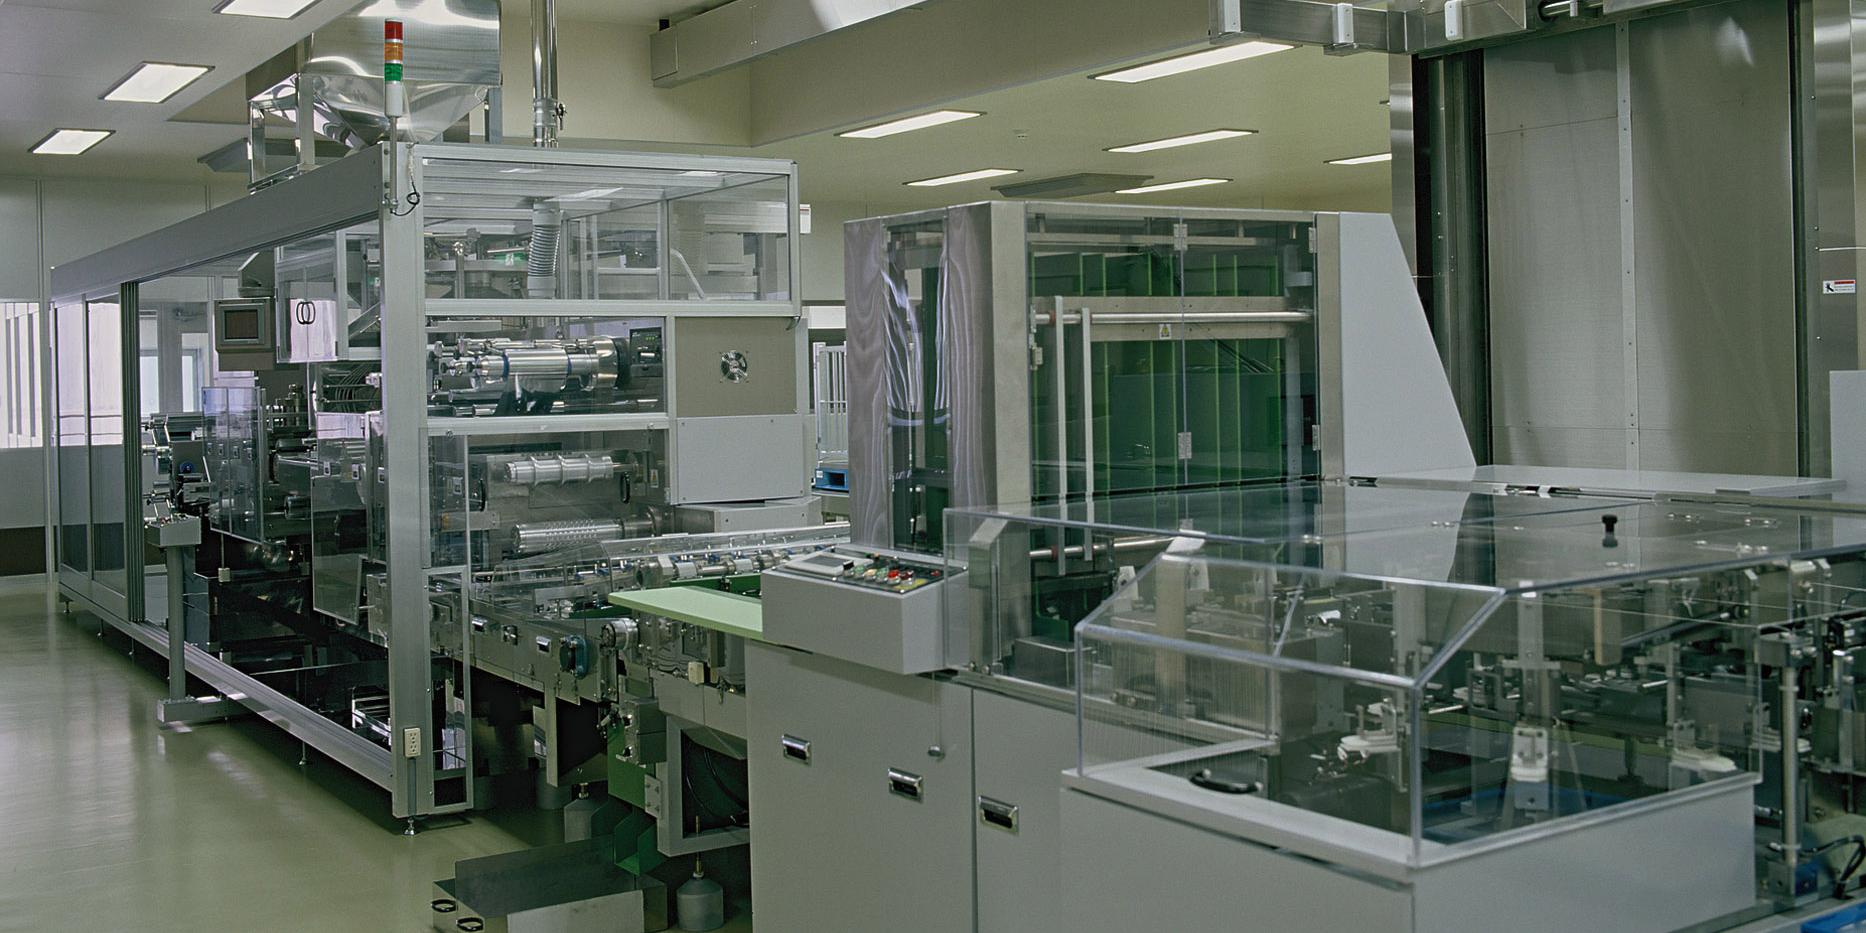 Fujifilm Wako Pure Chemical Corp